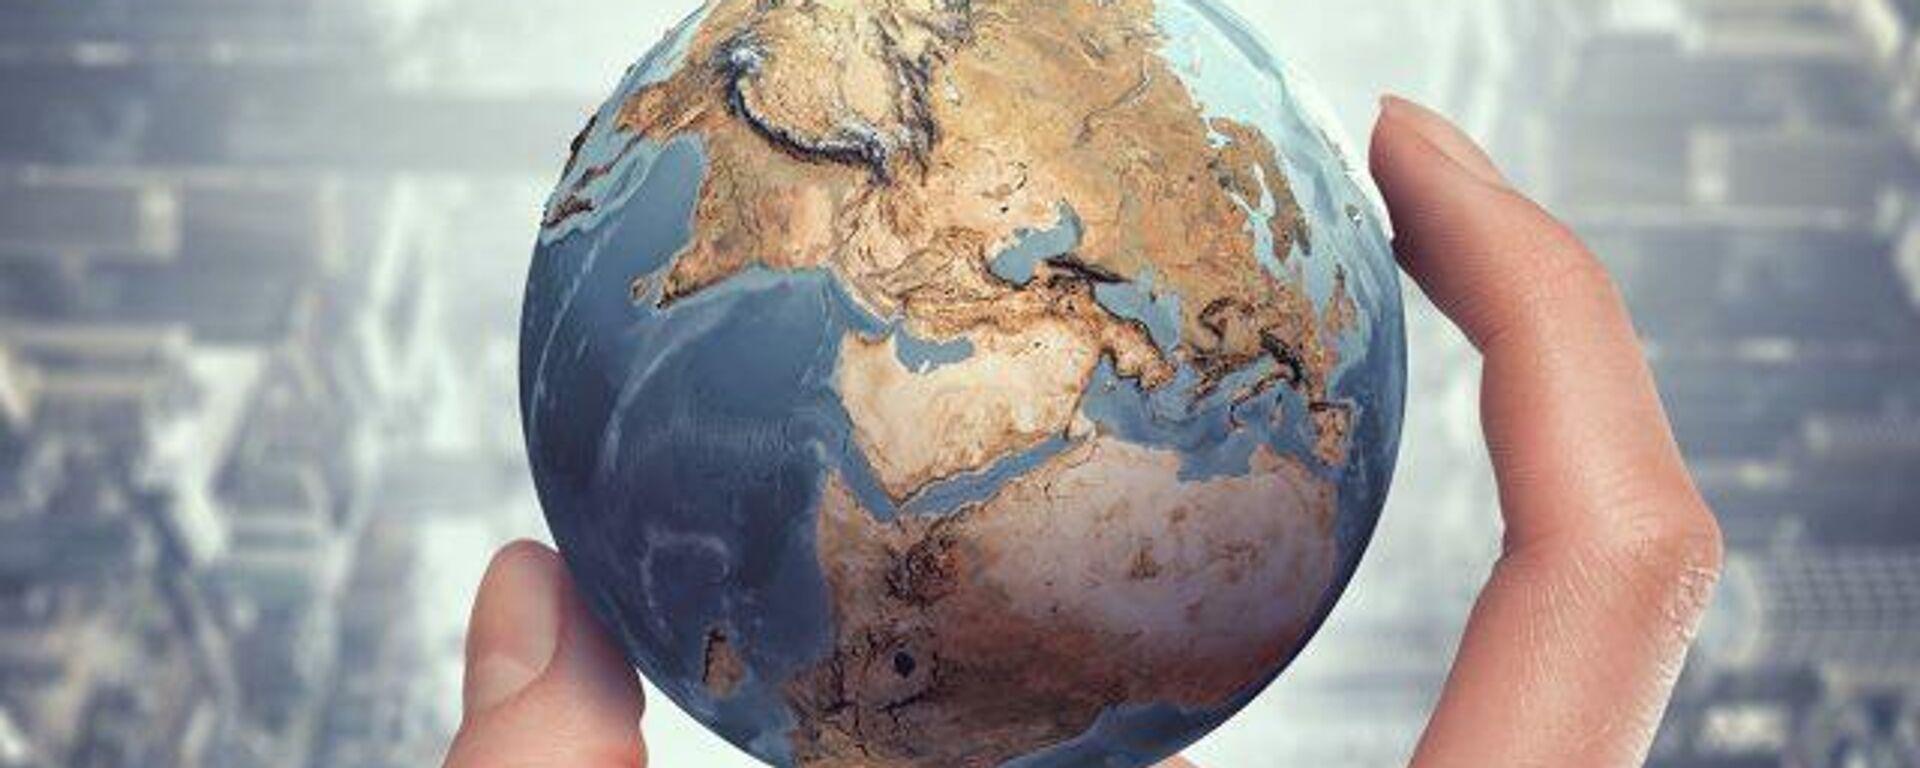 Brasil: Bolsonaro avanza en privatizar la mayor empresa eléctrica de América Latina - Sputnik Mundo, 1920, 14.07.2021